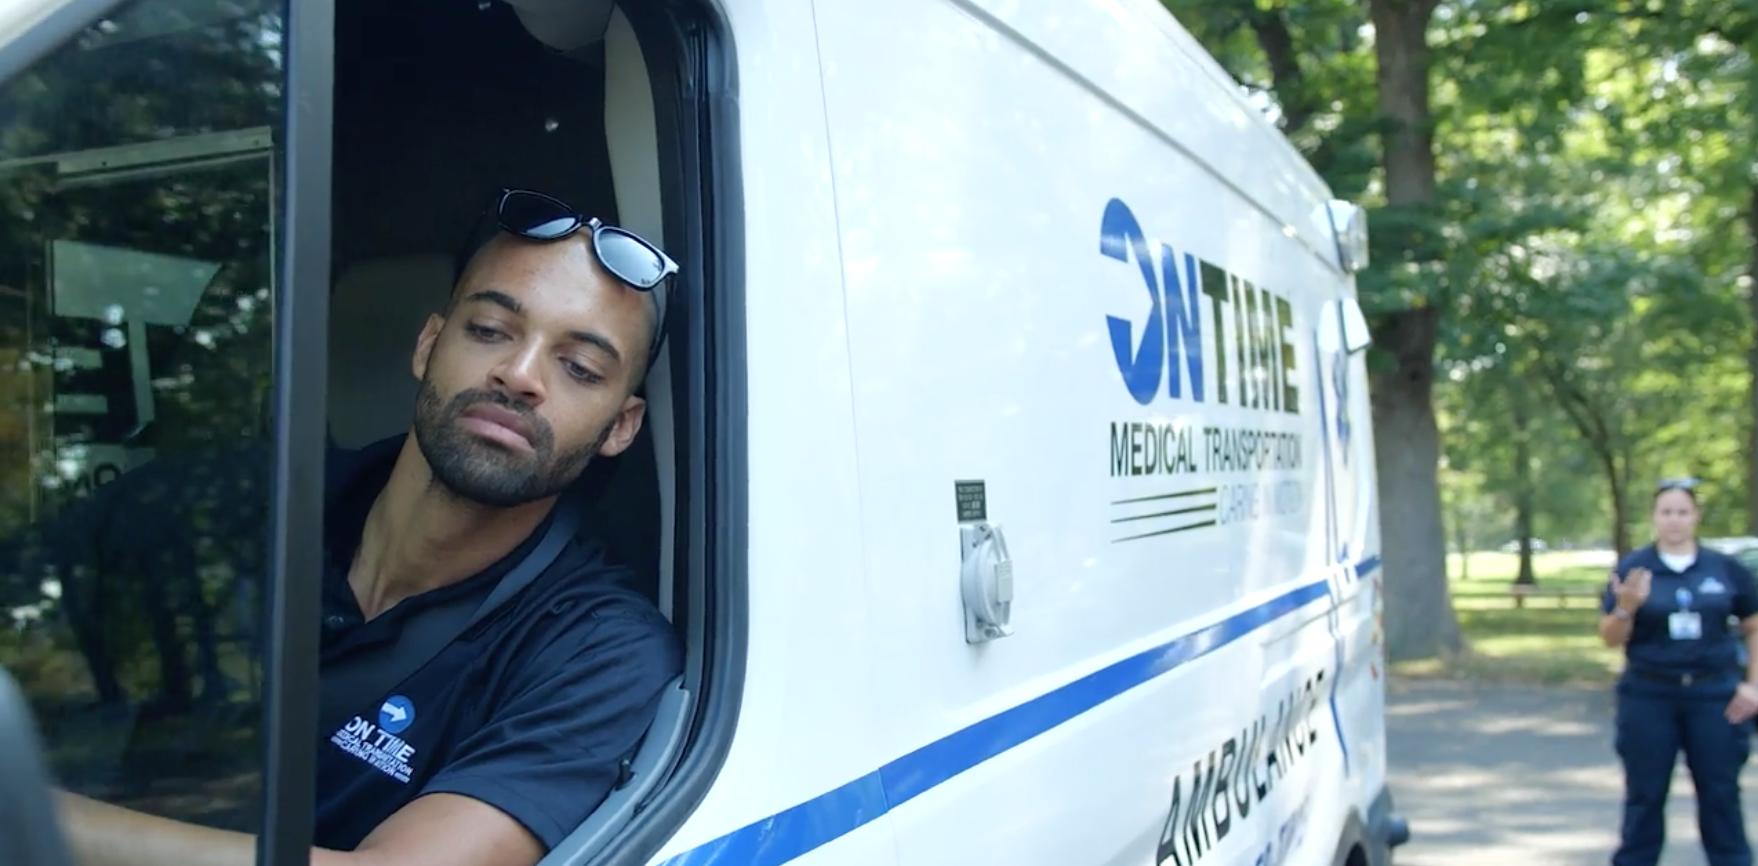 On Time Ambulance | EMR Jobs Roselle NJ